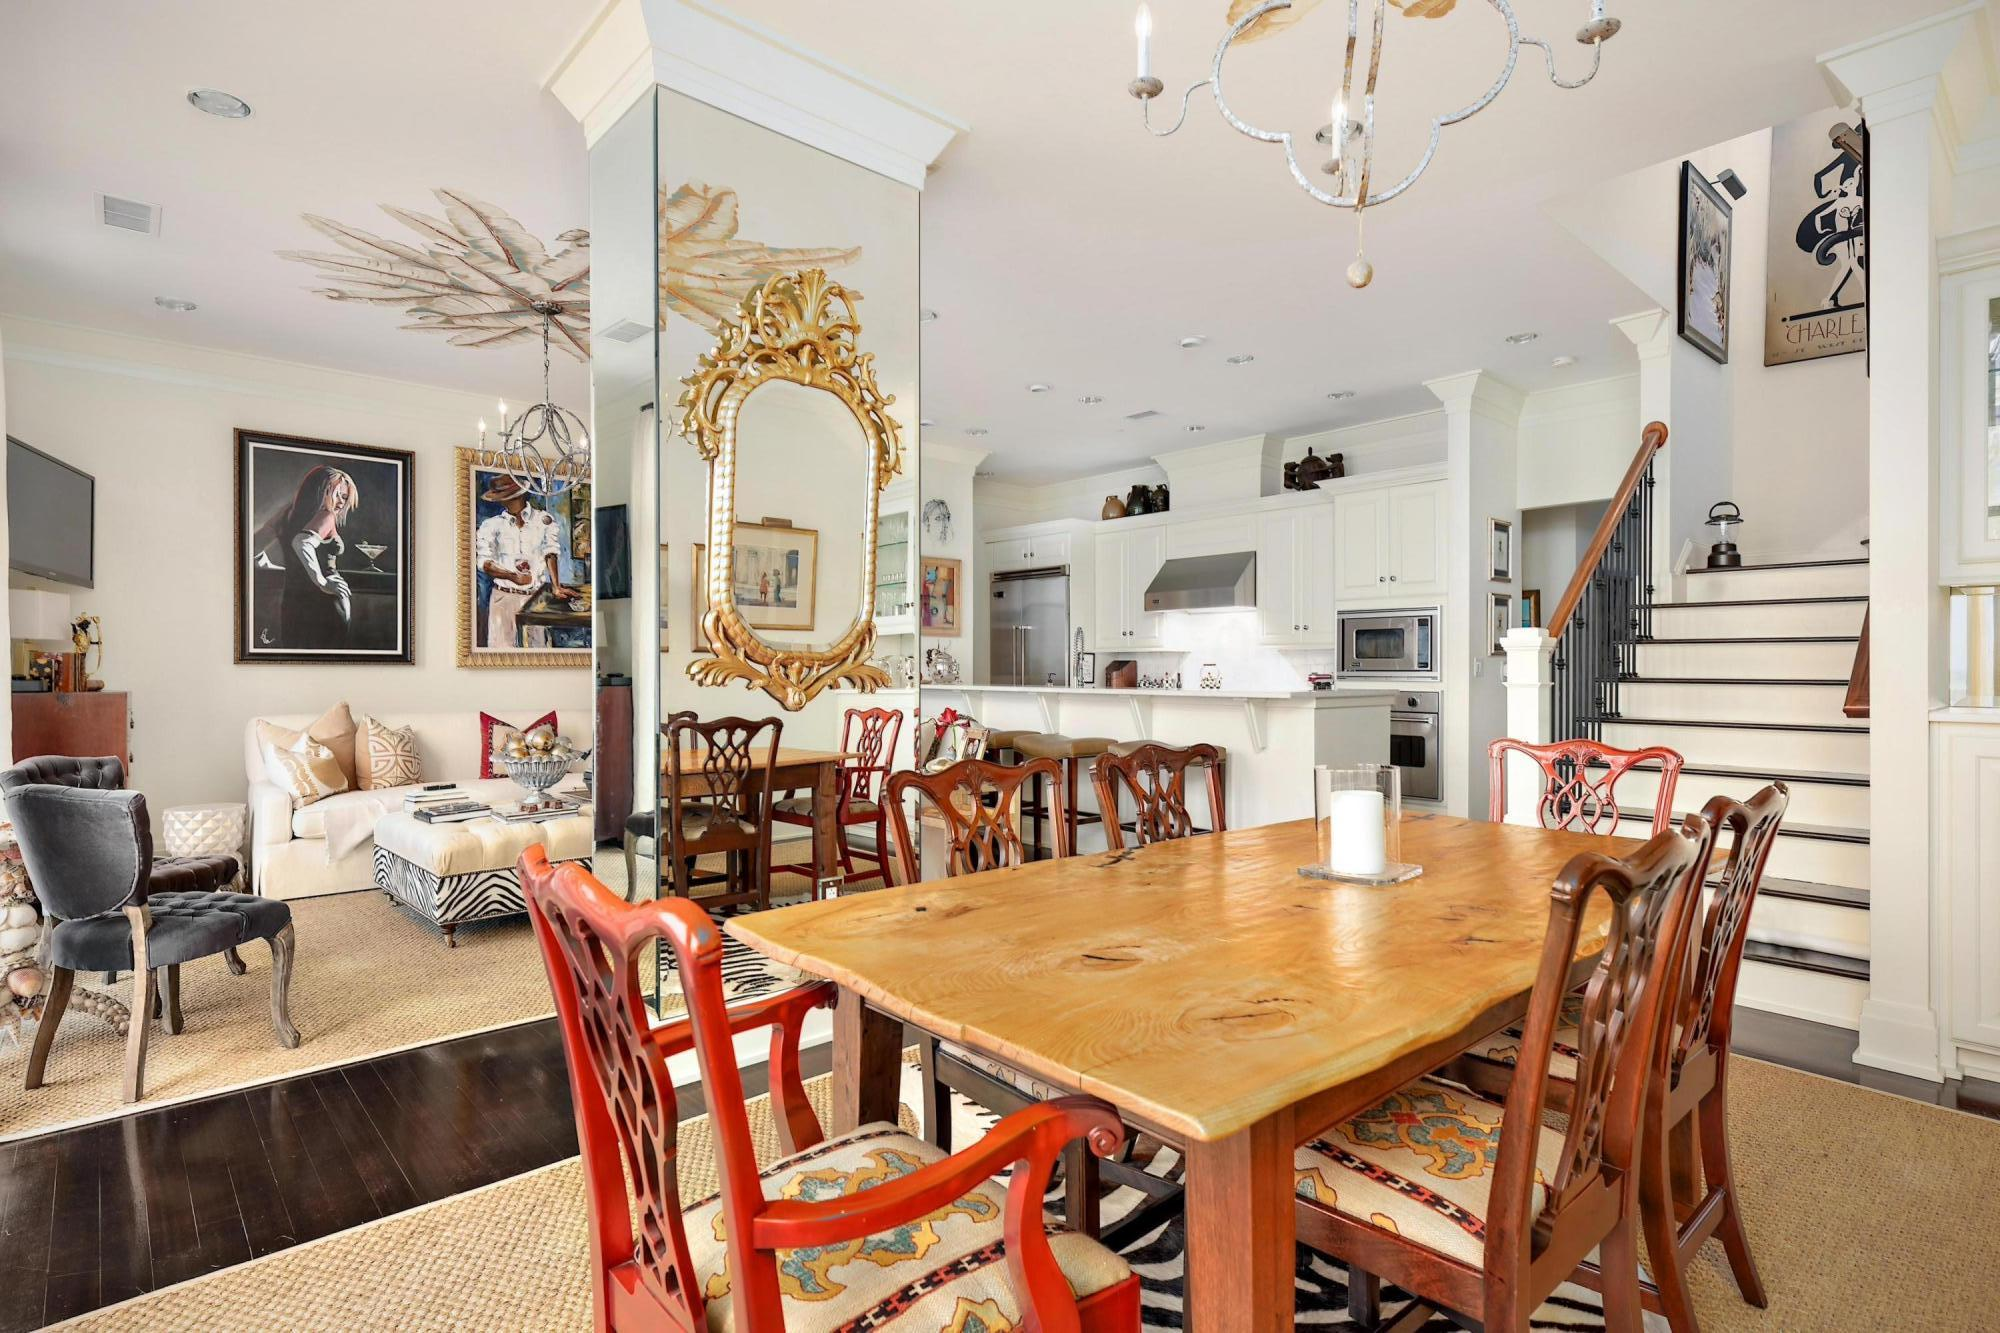 Tides Condominiums Homes For Sale - 363 Cooper River, Mount Pleasant, SC - 6